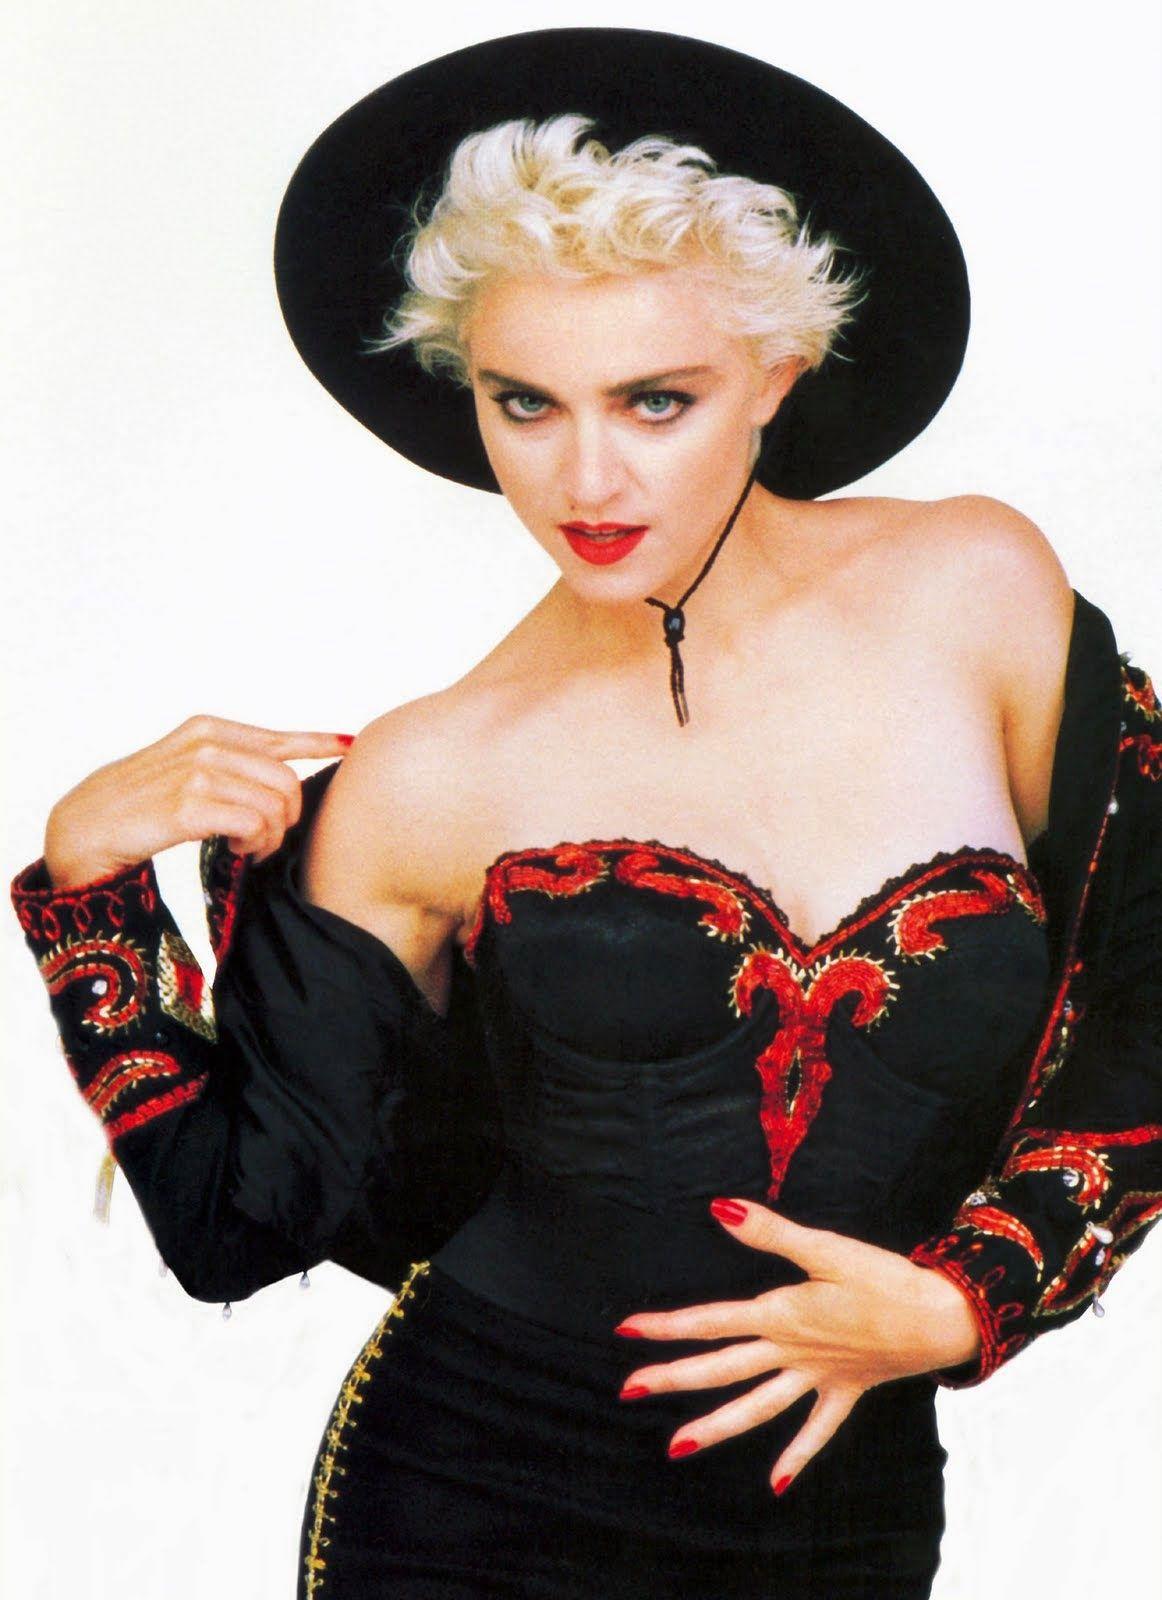 1987 La Isla Bonita You Can Dance Photoshoot Fotos Artisticas Mujer Madonna Famosos